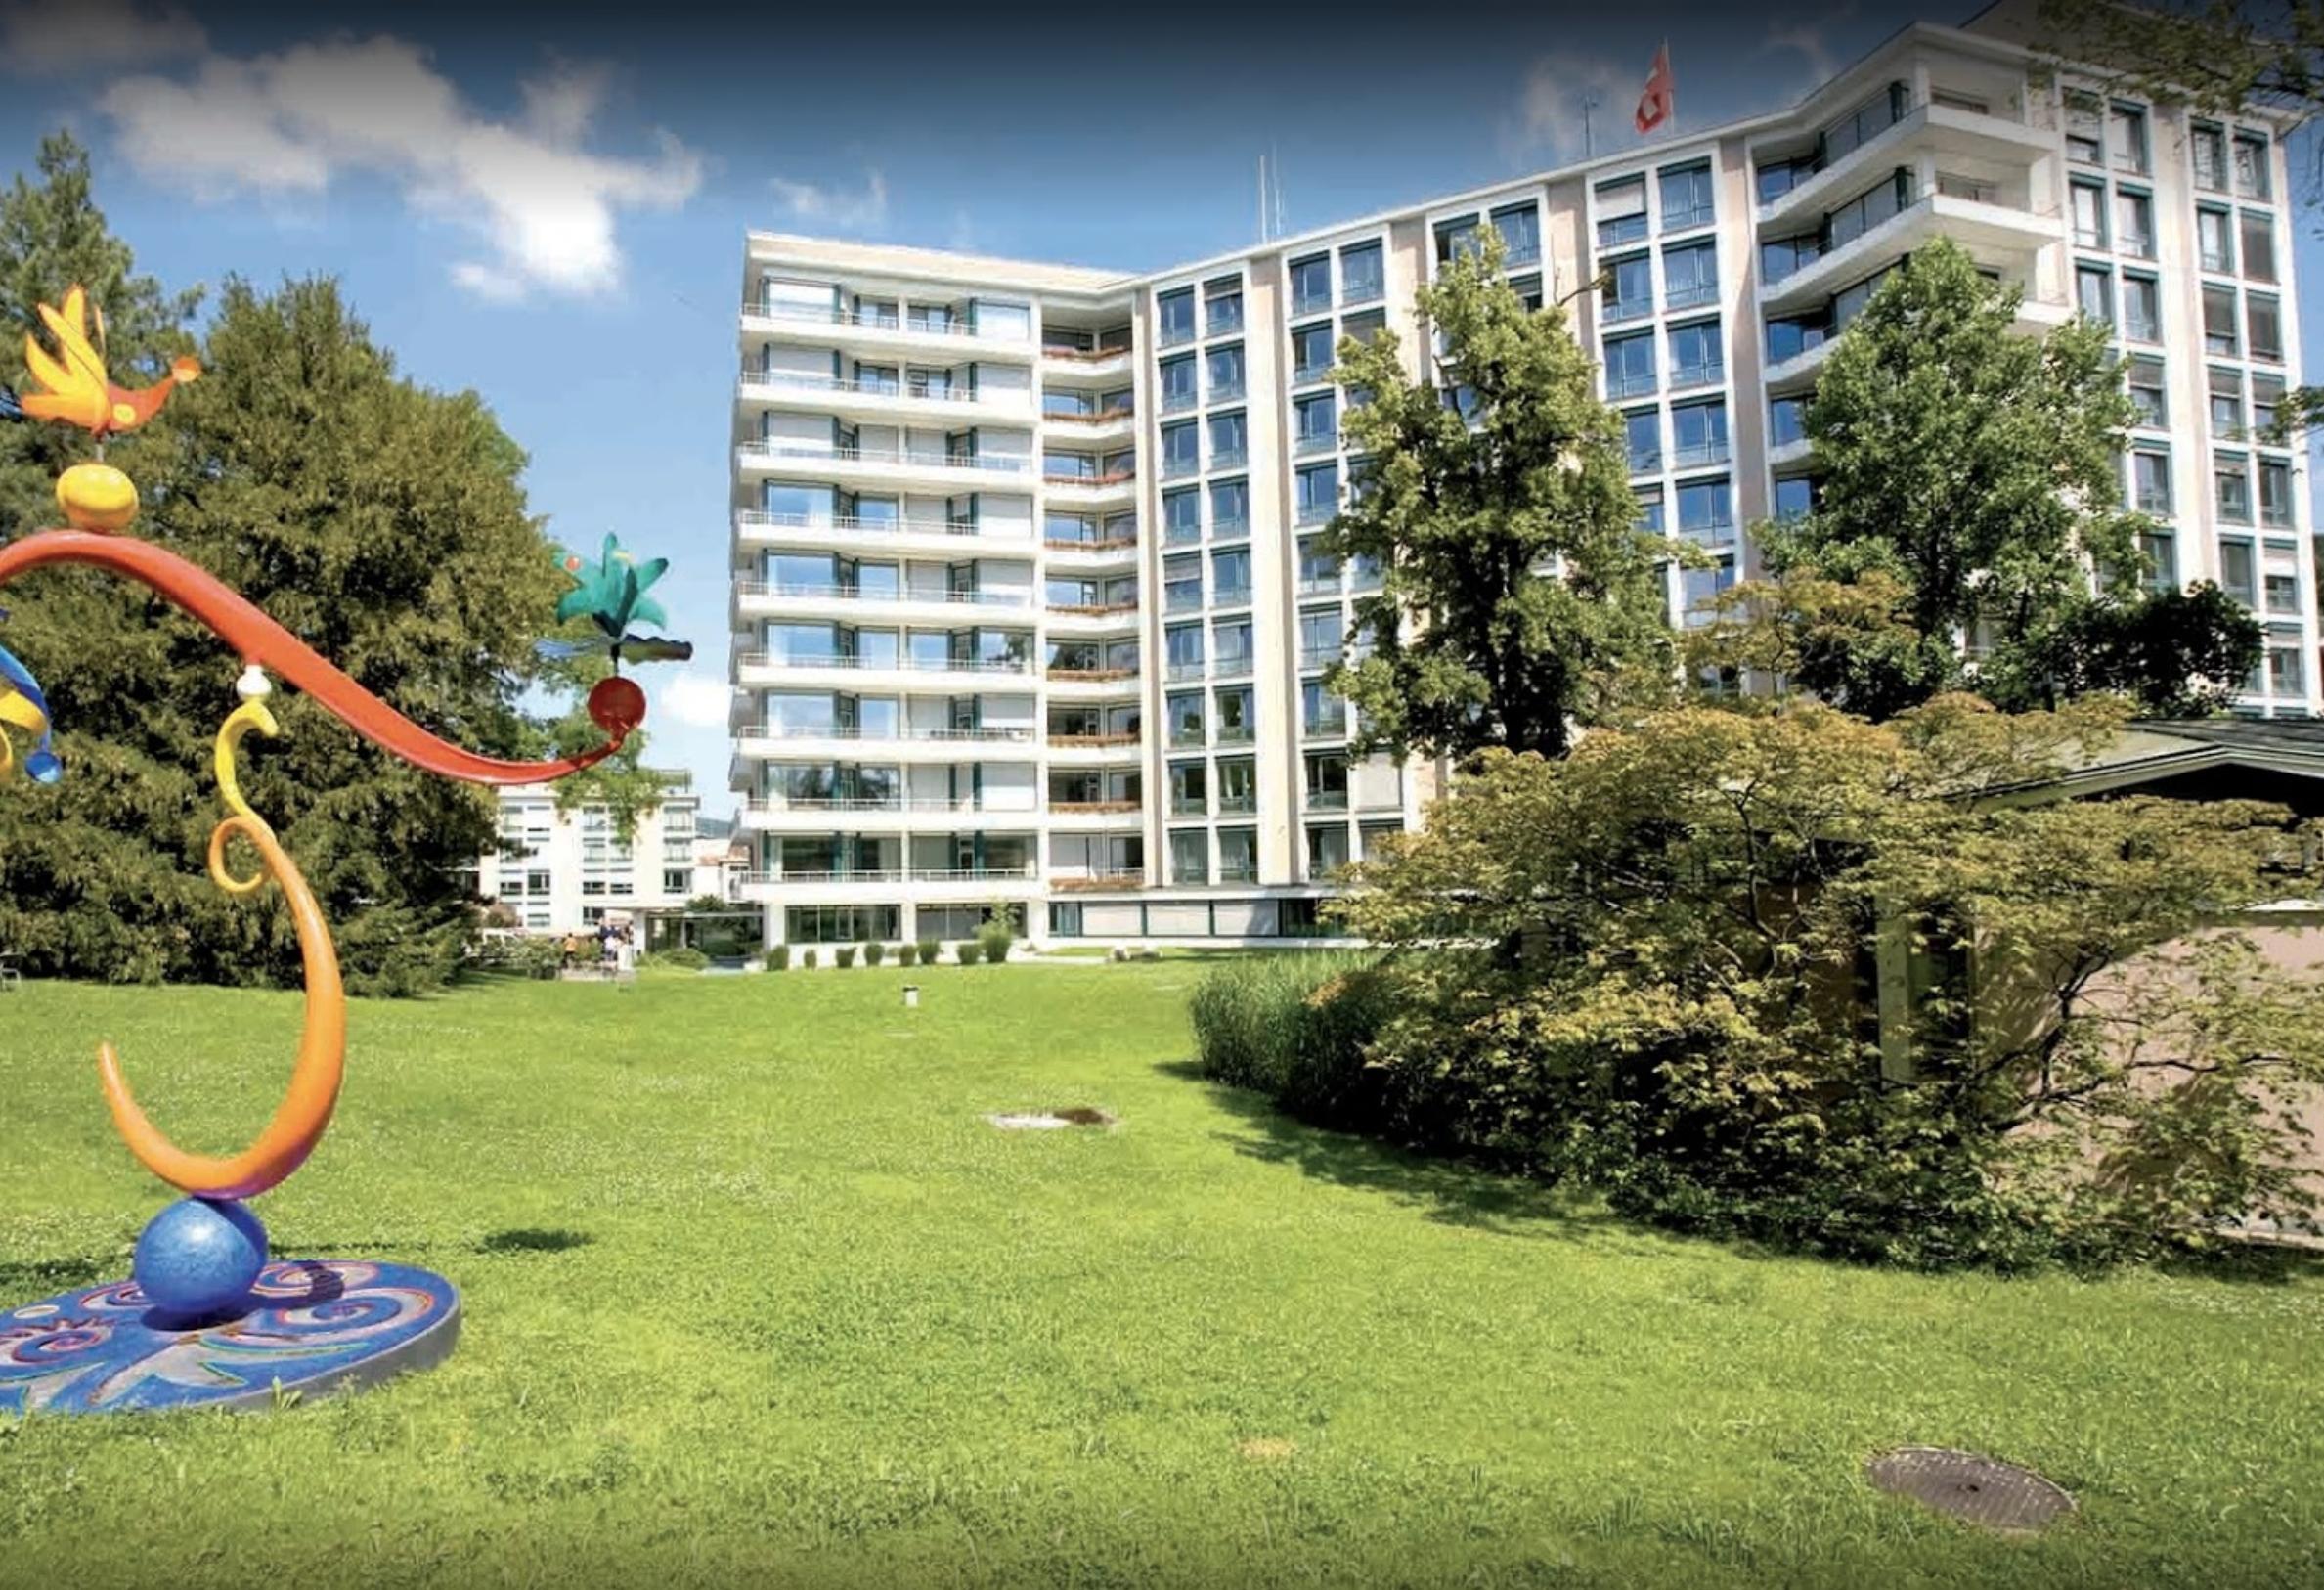 2020-10-13 09_31_11-kantonsspital baselland – Google Suche